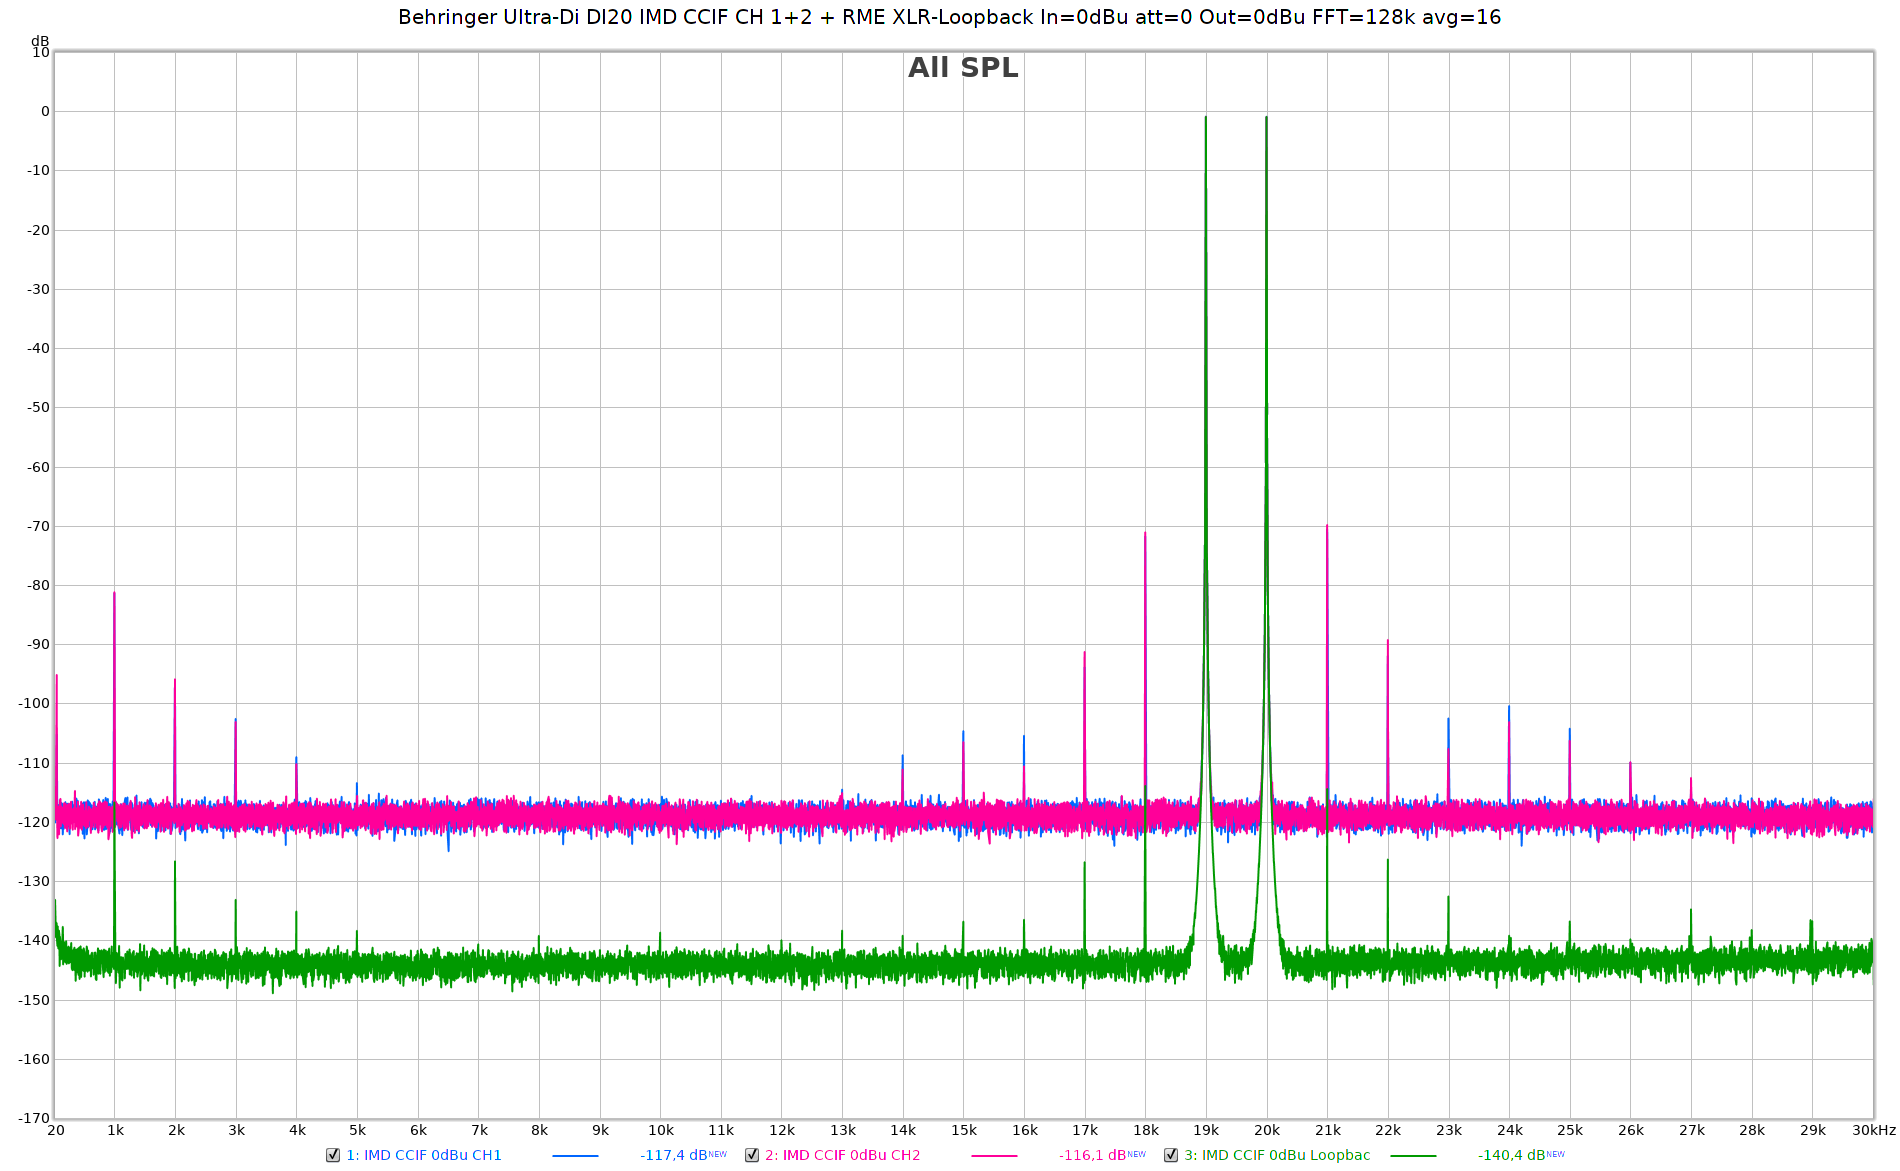 Behringer Ultra-Di DI20 IMD CCIF CH 1+2 + RME XLR-Loopback In=0dBu att=0 Out=0dBu FFT=128k avg...png